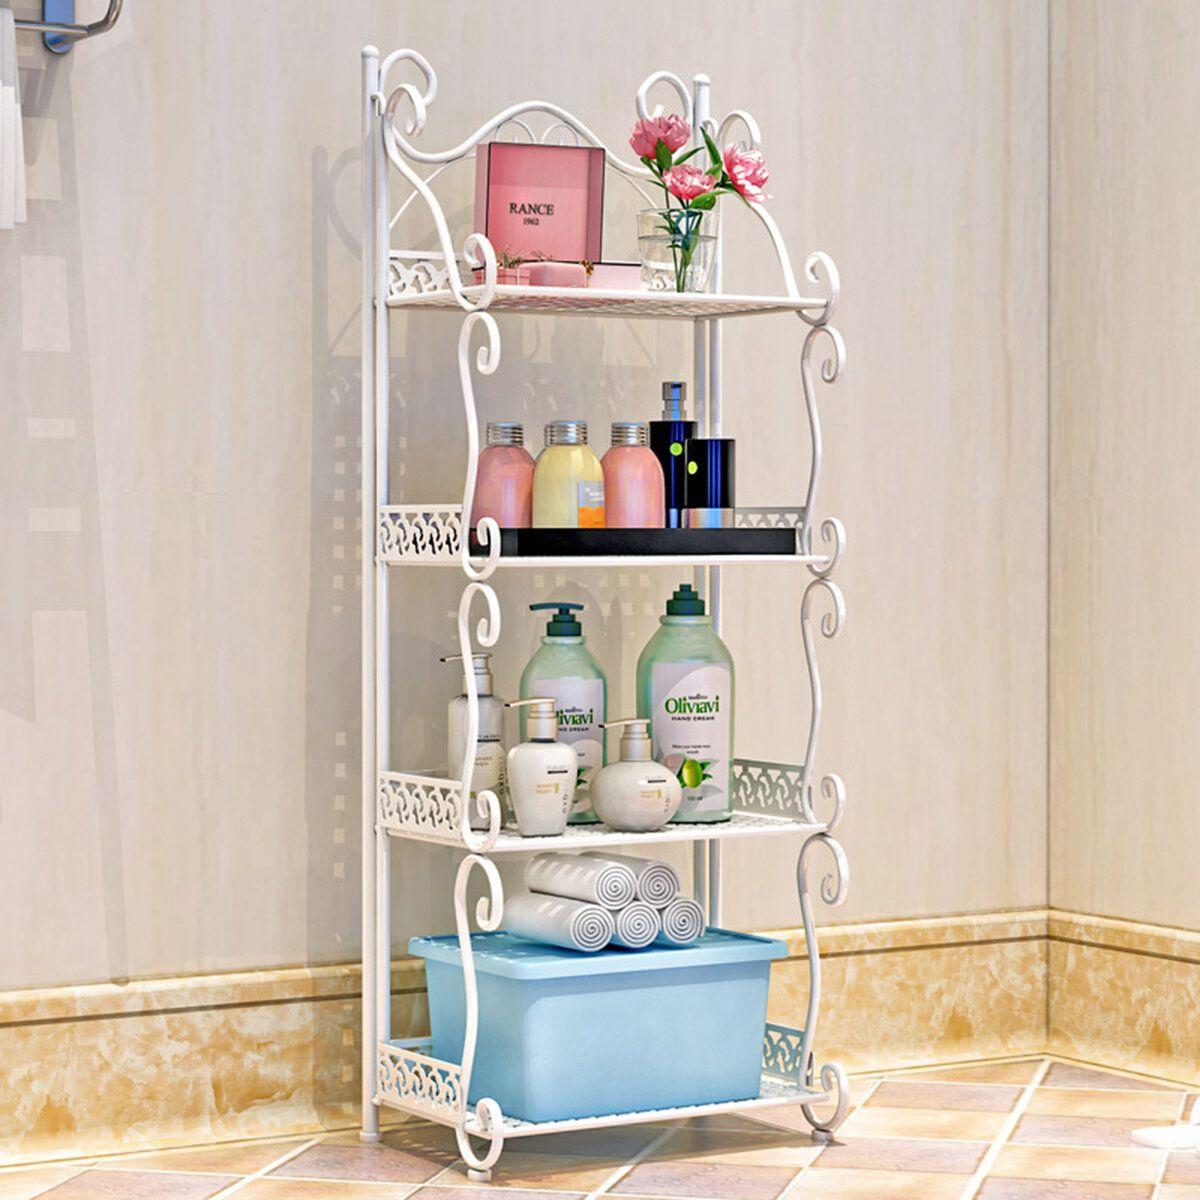 DMM US$47.45 4 Tiers Iron Folding Storage Shelf Nordic Minimalist Multifunctional Bookshelf Storage Racks Holders for Office Home Bedroom Bathroom Kitchen